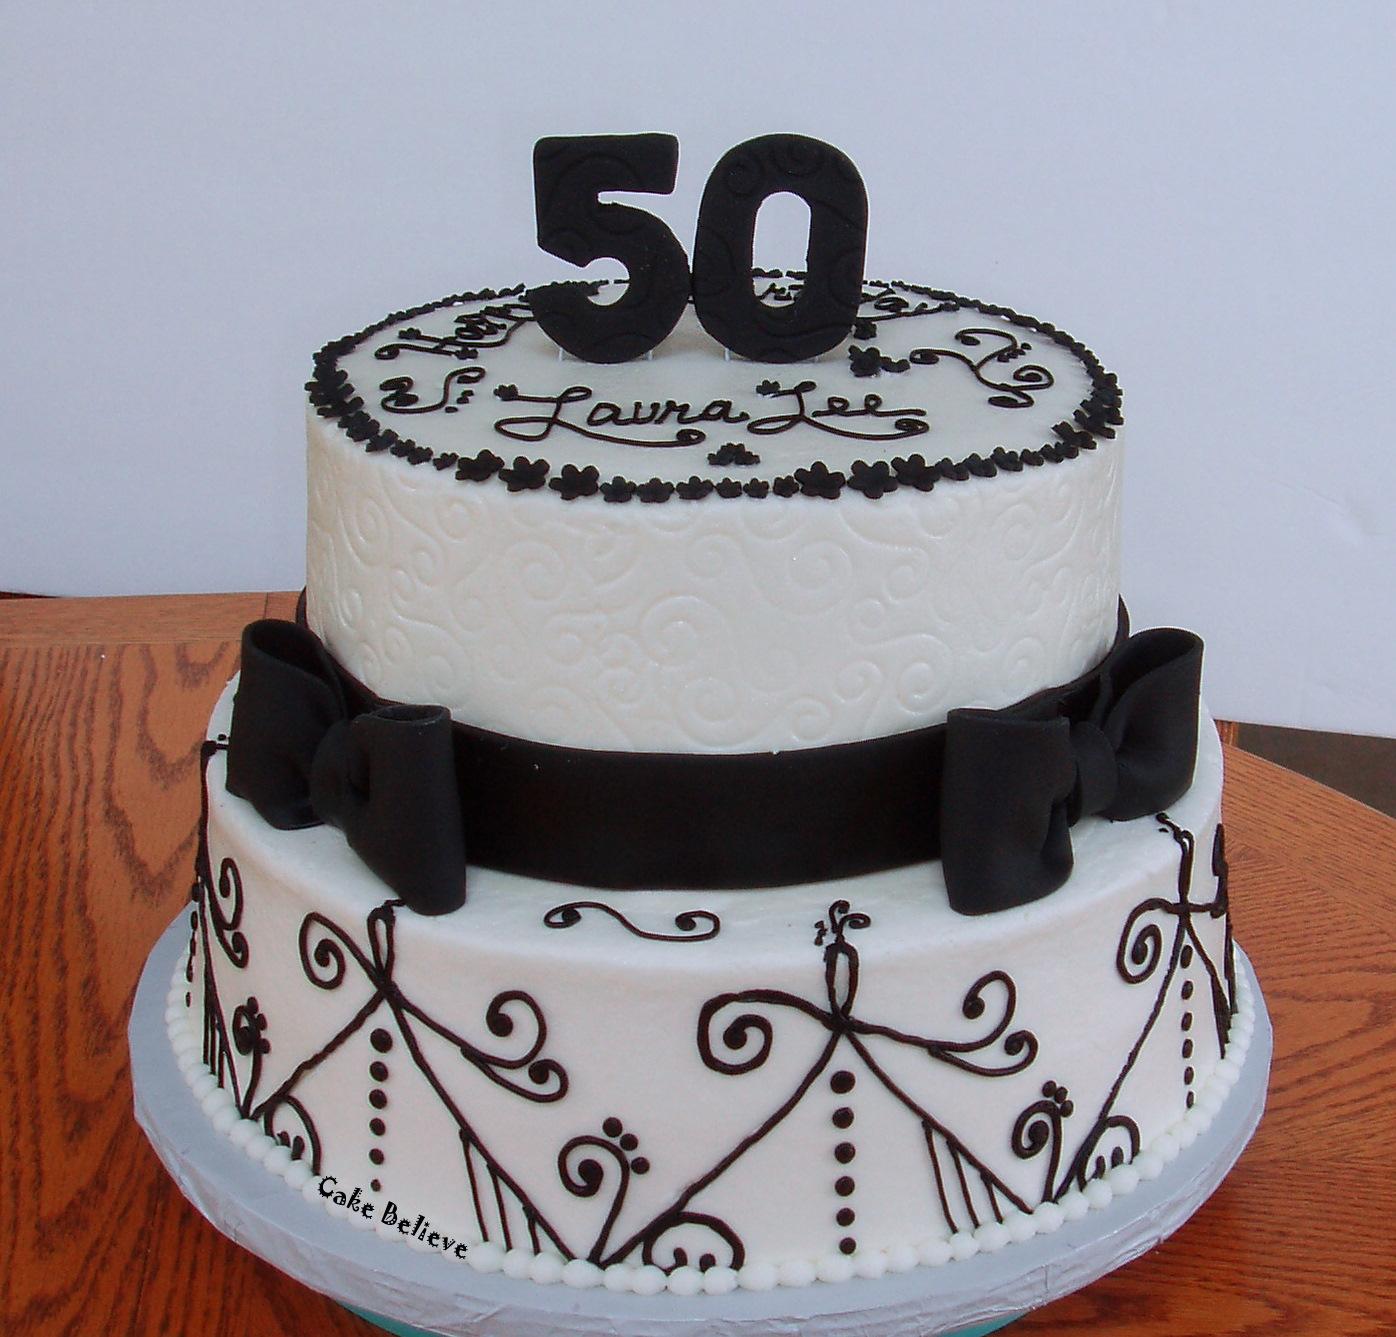 8 Fifty Birthday Cakes For Men Photo Man 50th Birthday Cake Ideas